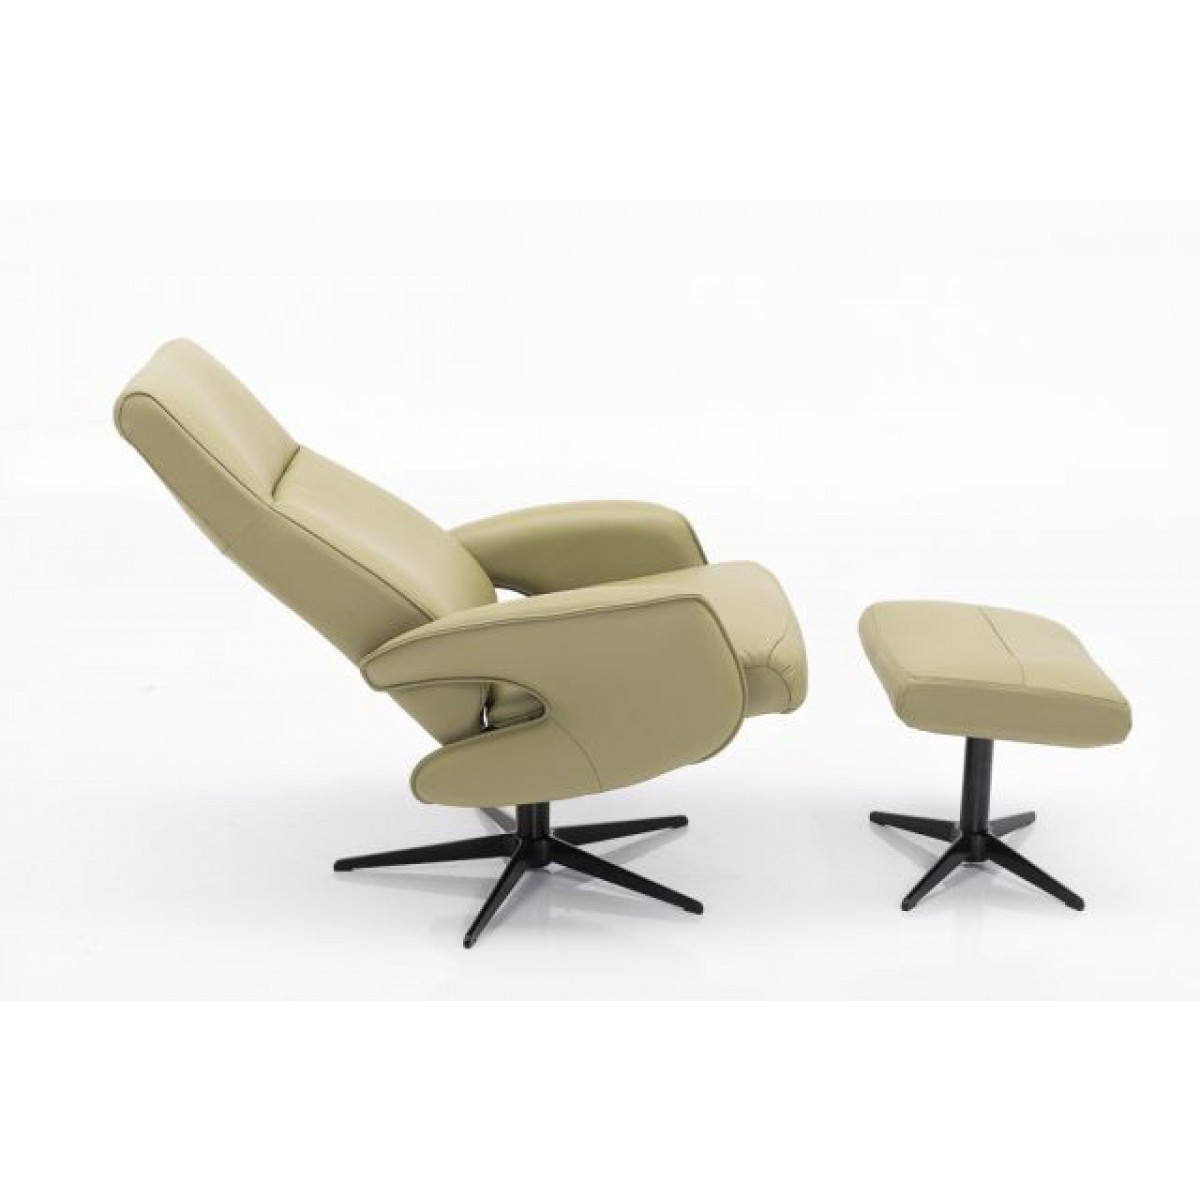 elas-draaifauteuil-relax-fauteuil-hjort-knudsen-semi-analin-leer